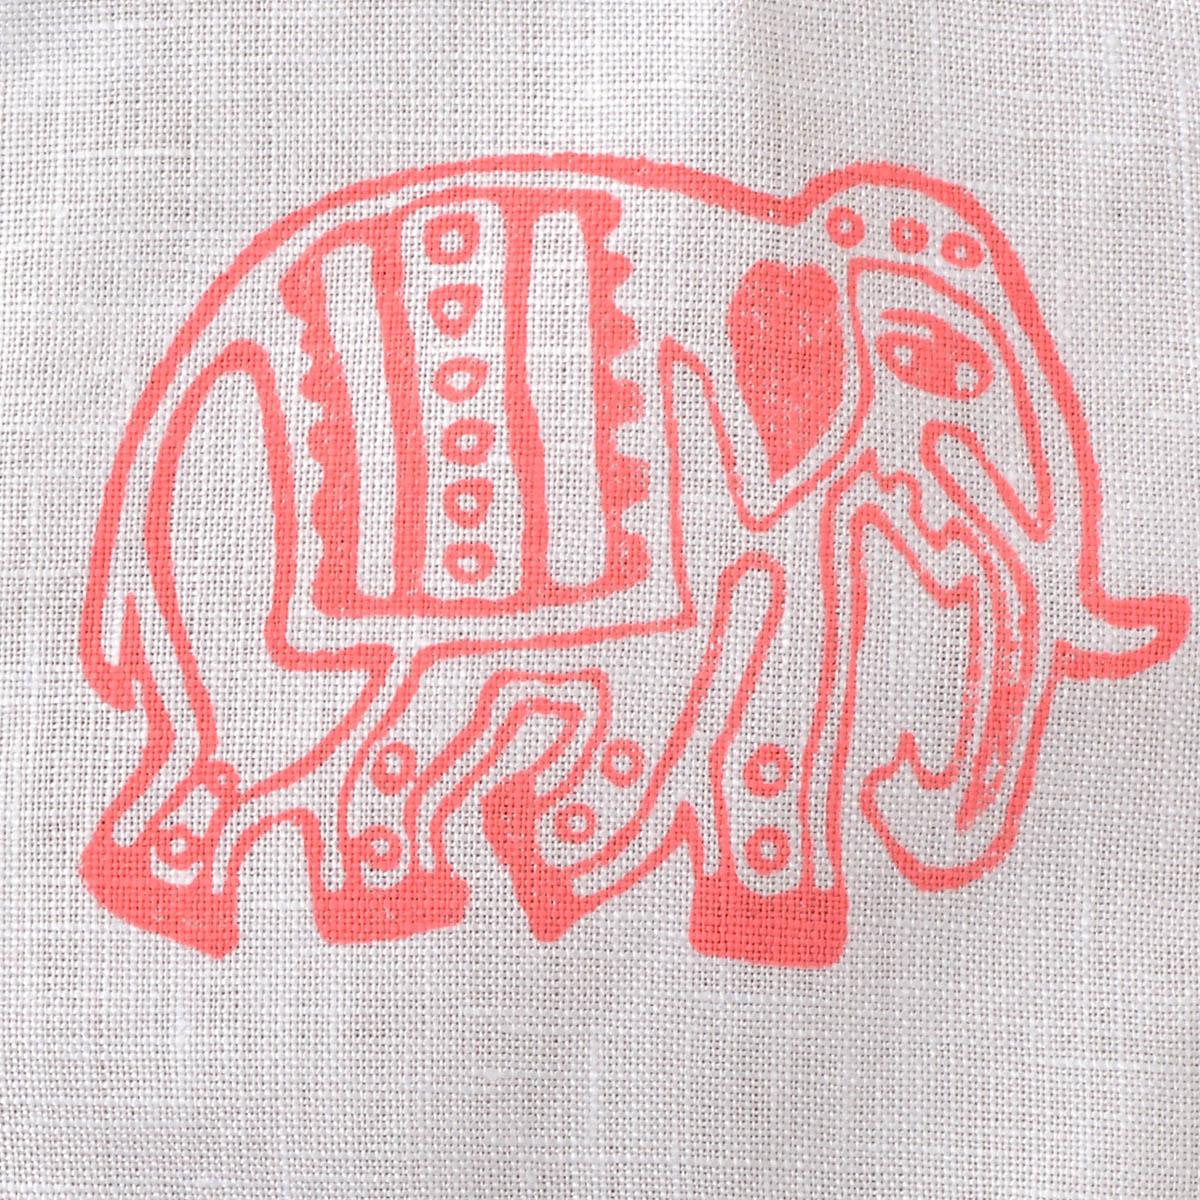 Fabric Creations™ Block Printing Stamps - Medium - Parade Elephant